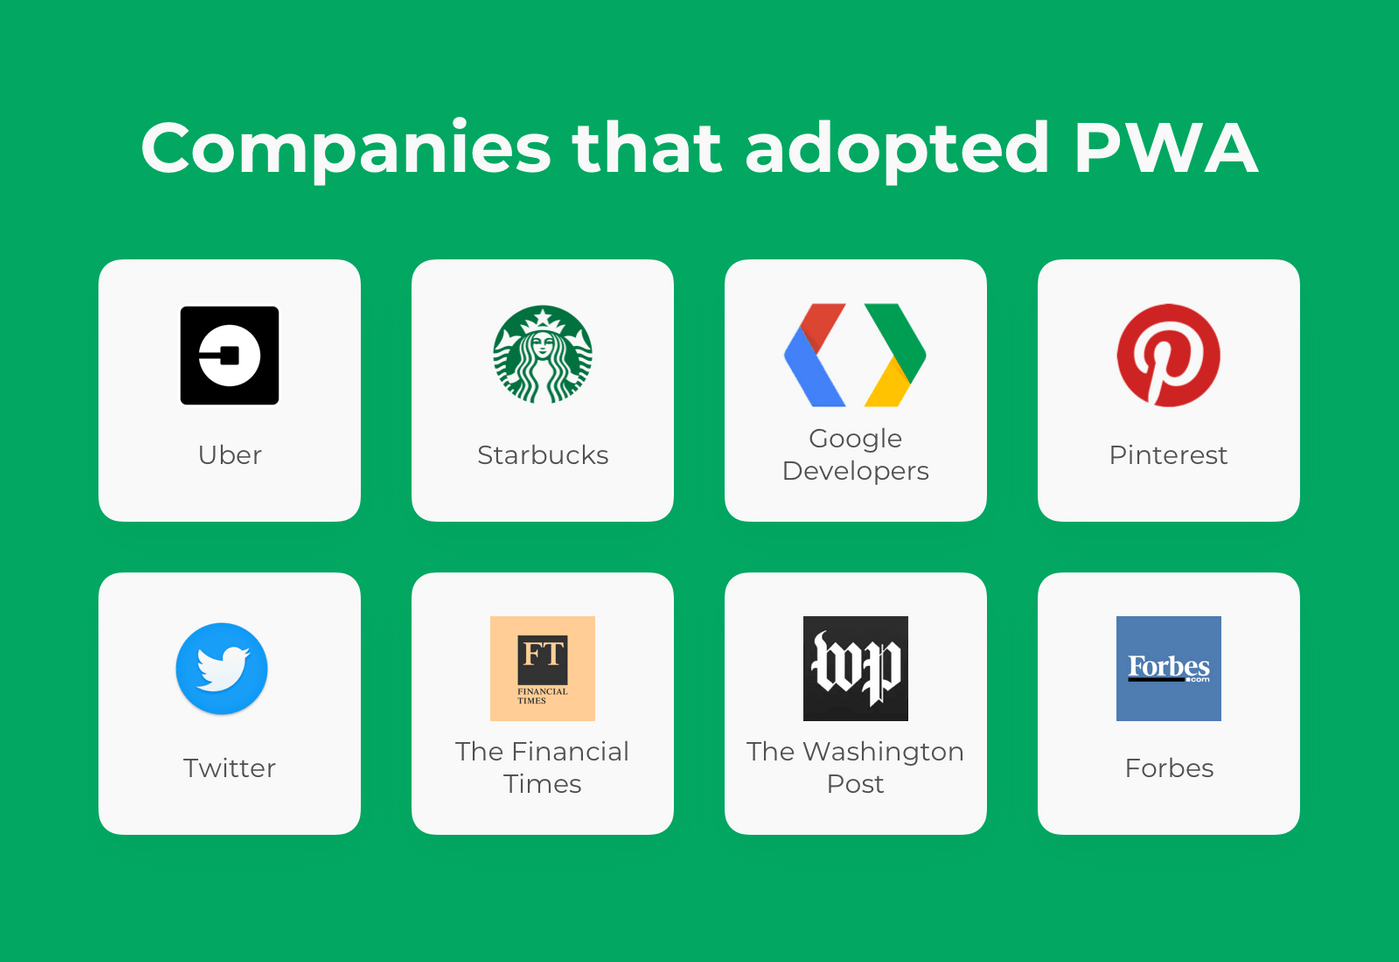 Companies that adopted PWA